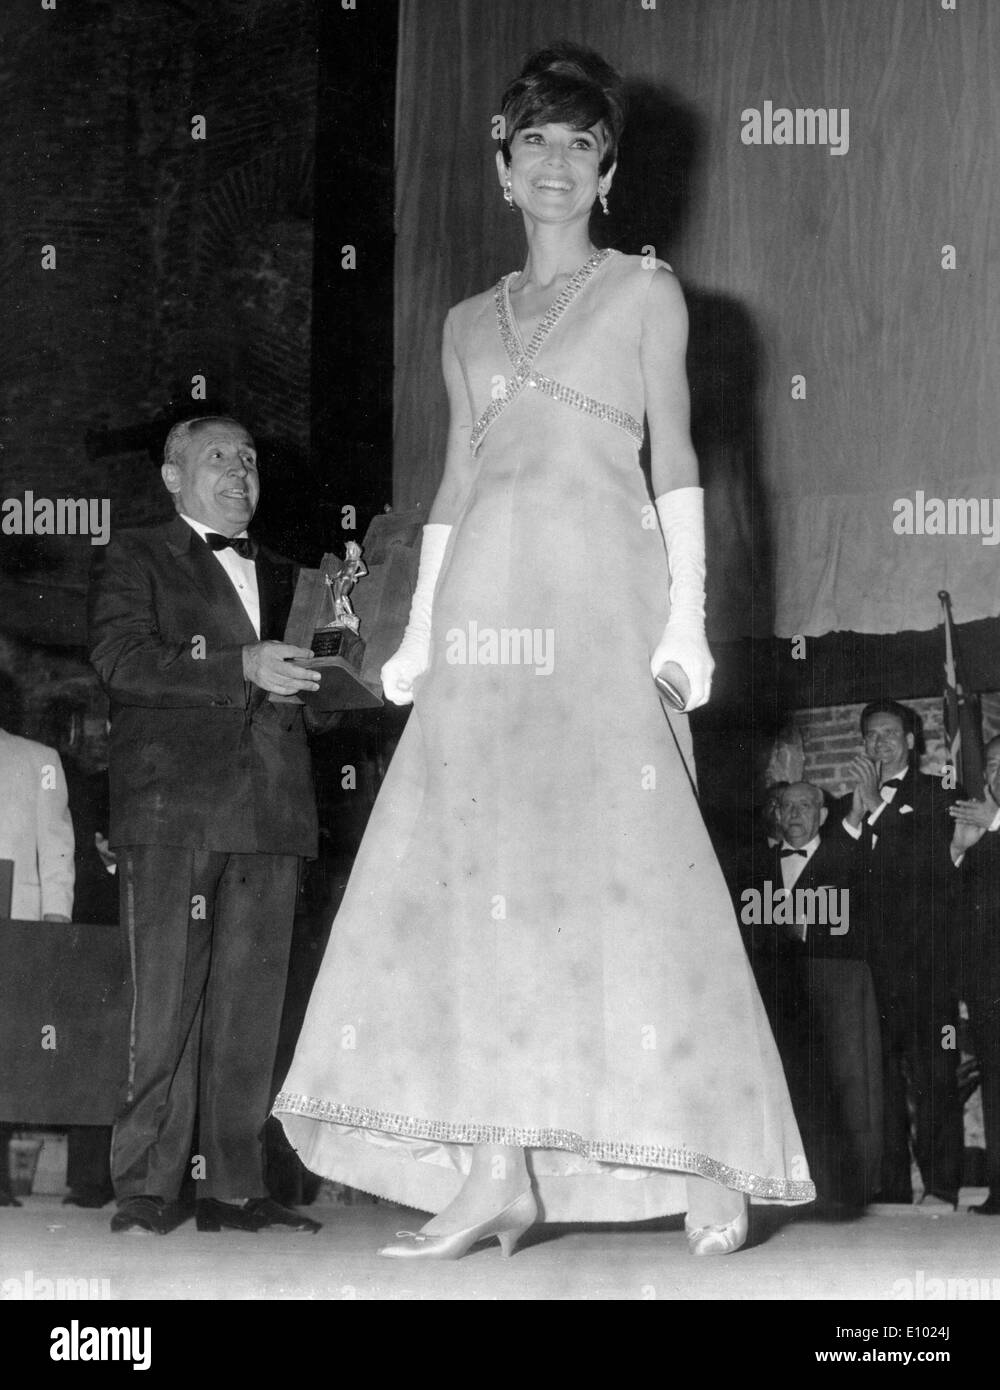 Actress Audrey Hepburn awarded for 'My Fair Lady' - Stock Image